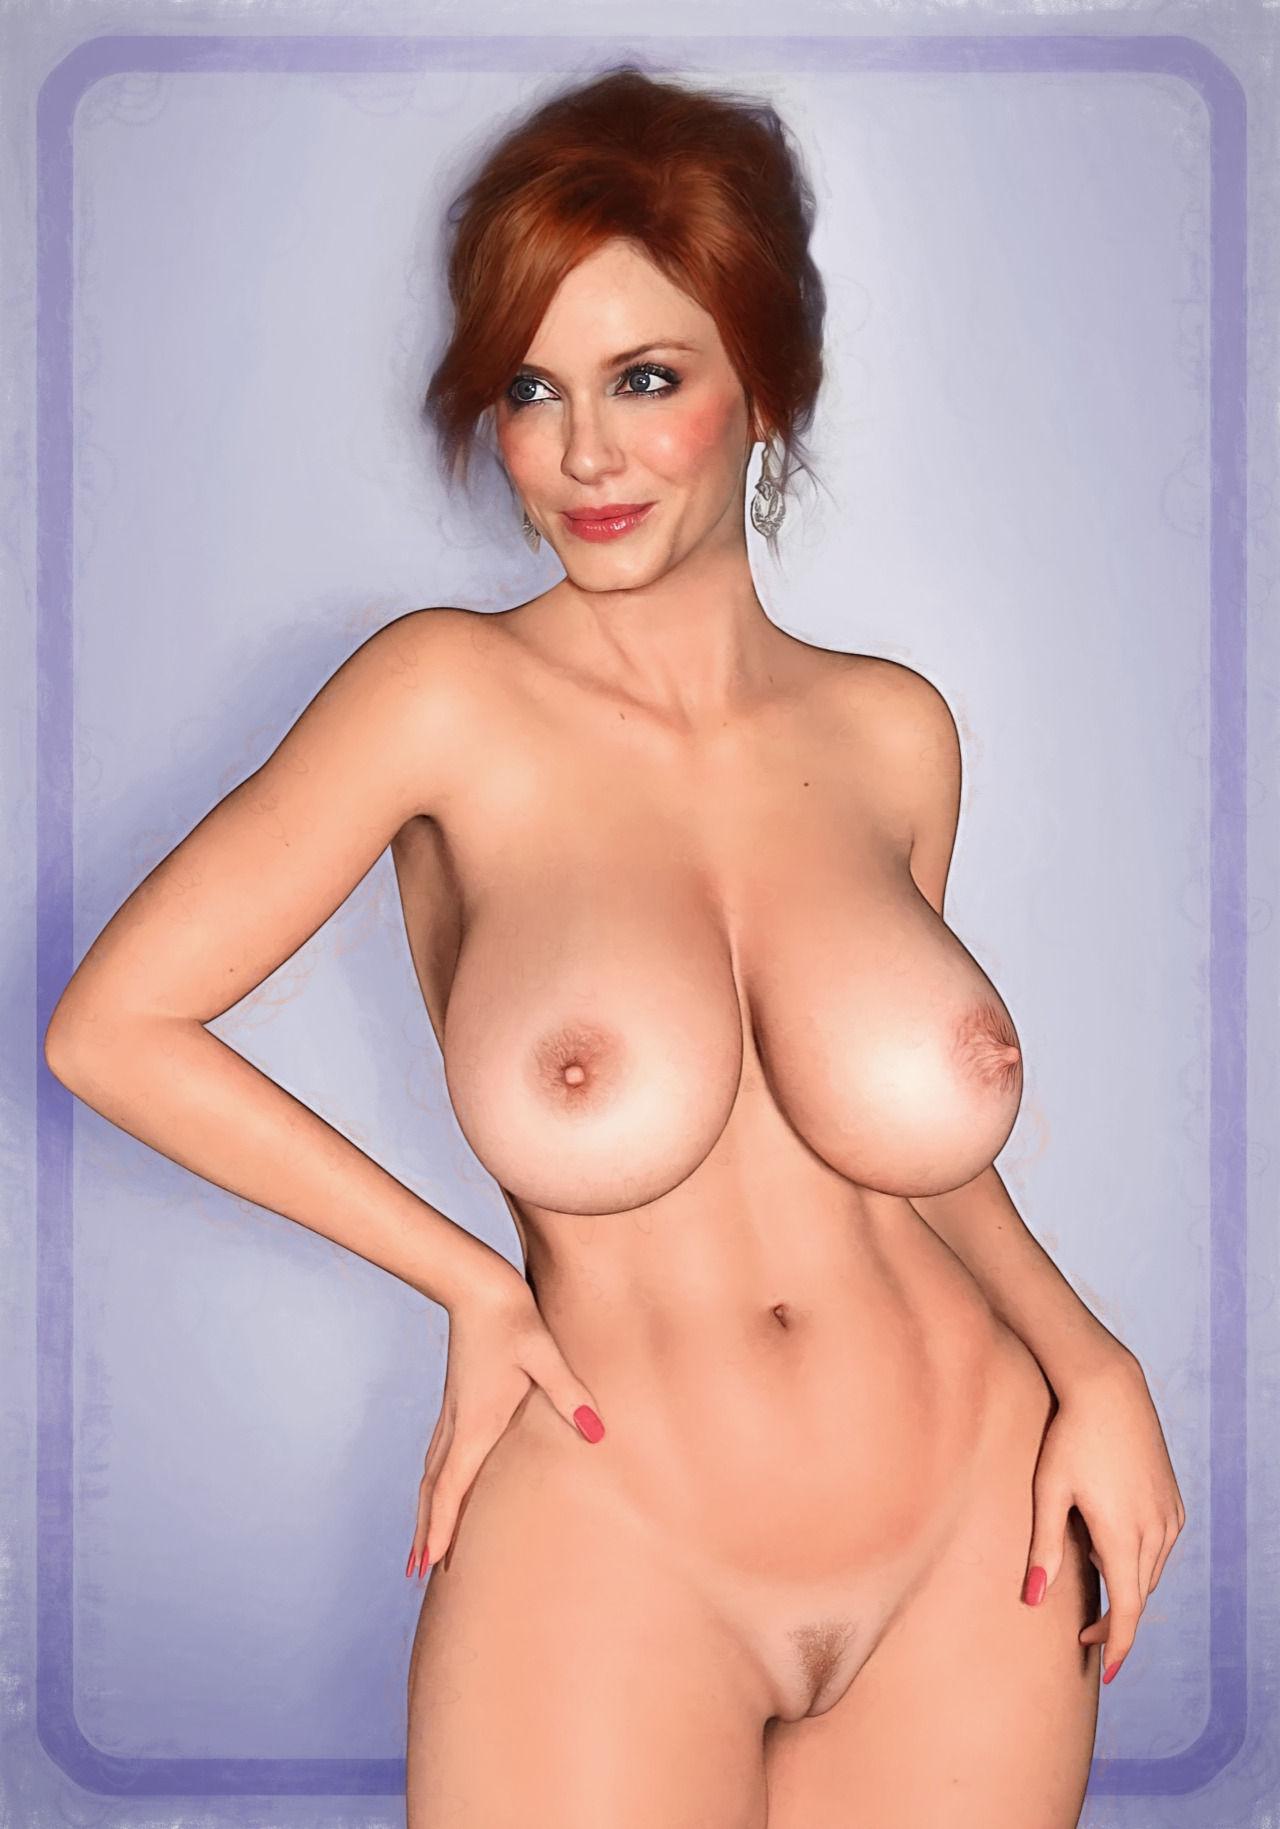 Olsen gemelos desnudos olsen gemelos desnudas fotos